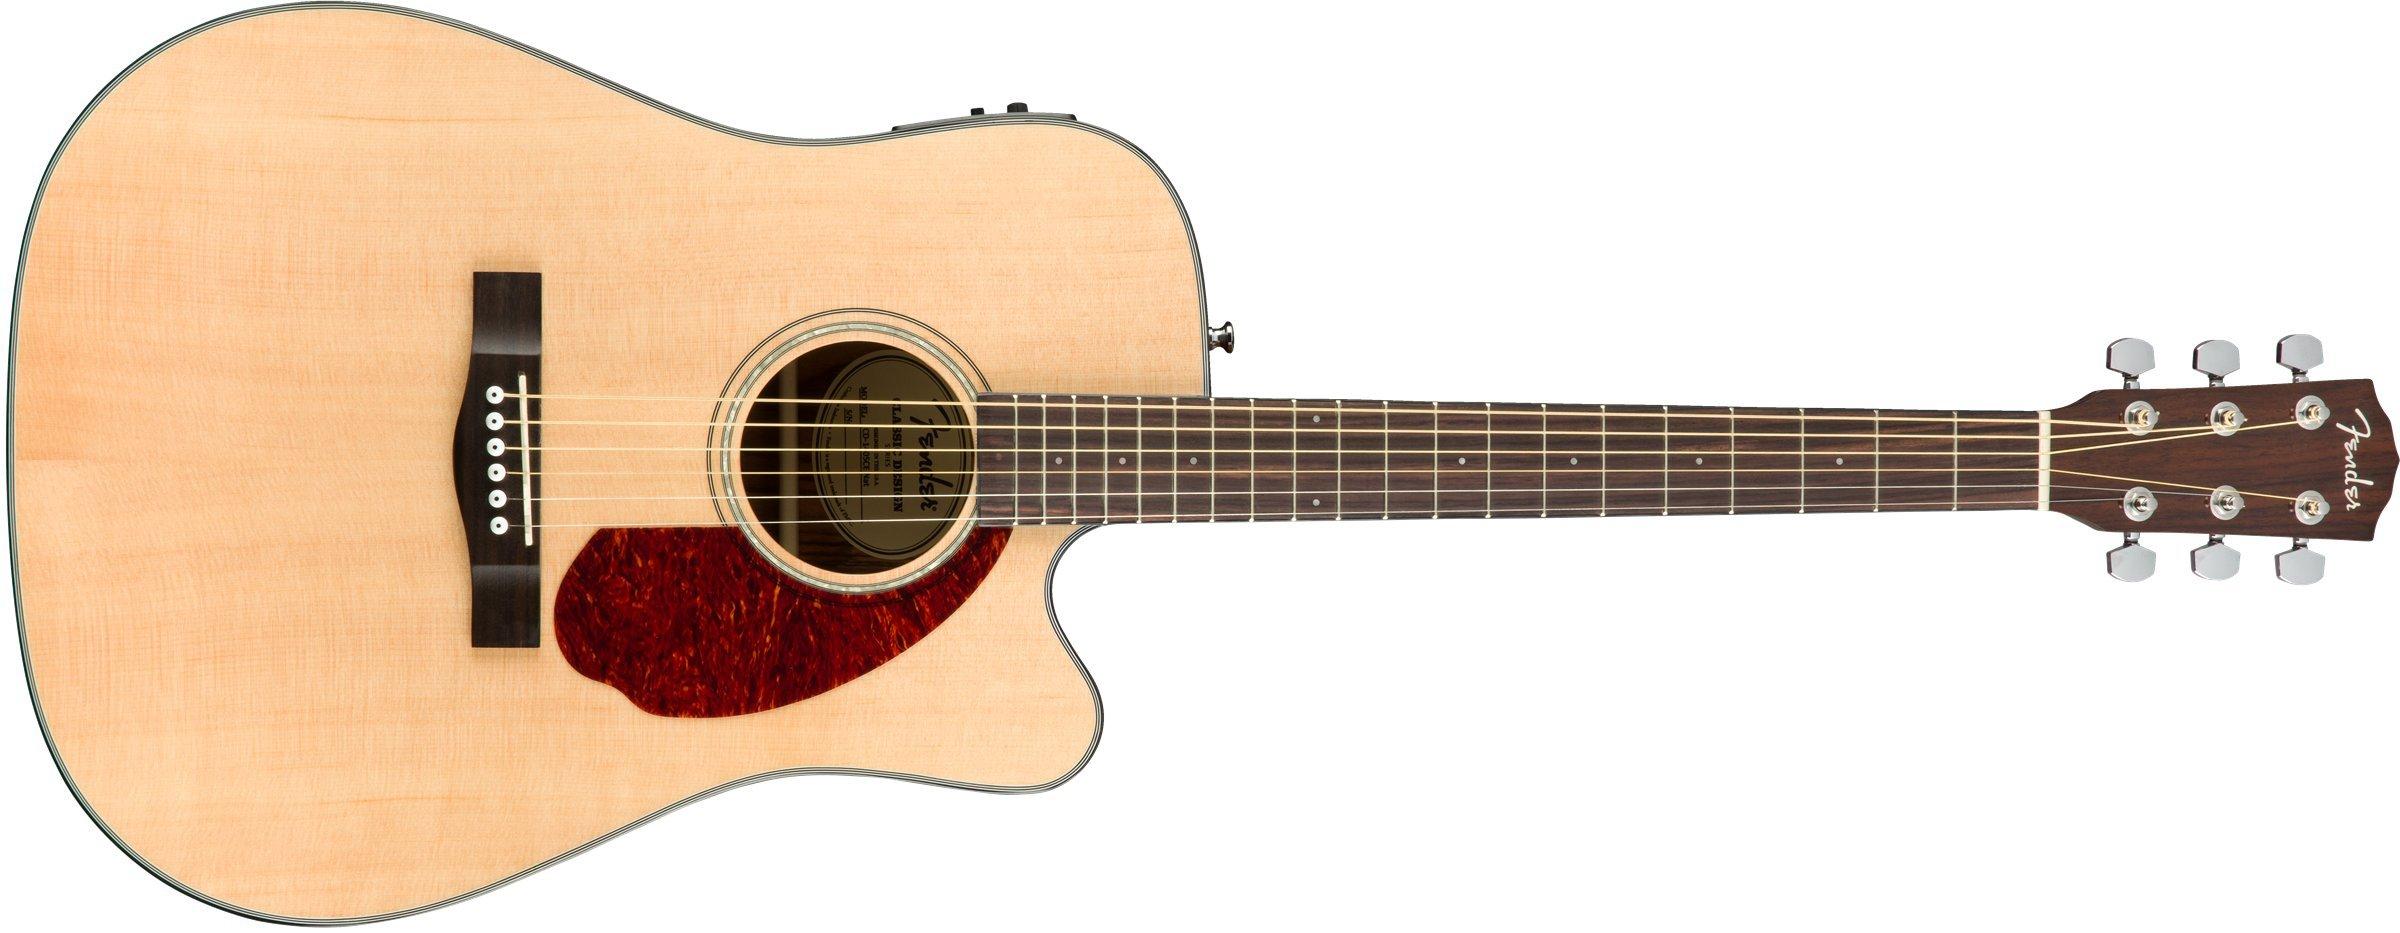 Fender CD-140SCE Natural + Estuche Guitarra Acústica: Amazon.es: Electrónica